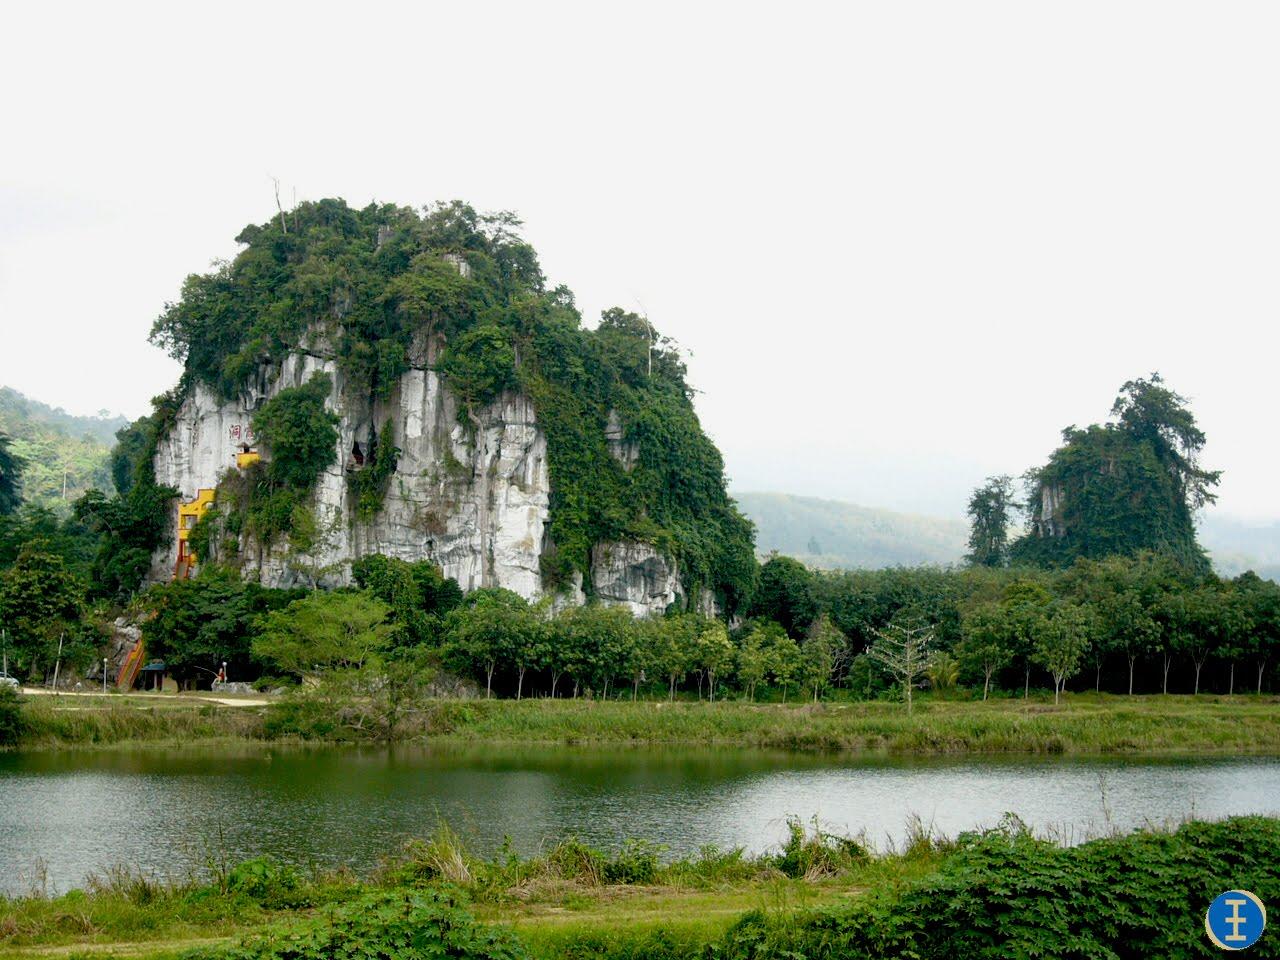 Gua Musang Malaysia  City pictures : ... . Beautiful Living.: Gua Musang Cave of Fox, Kelantan, Malaysia